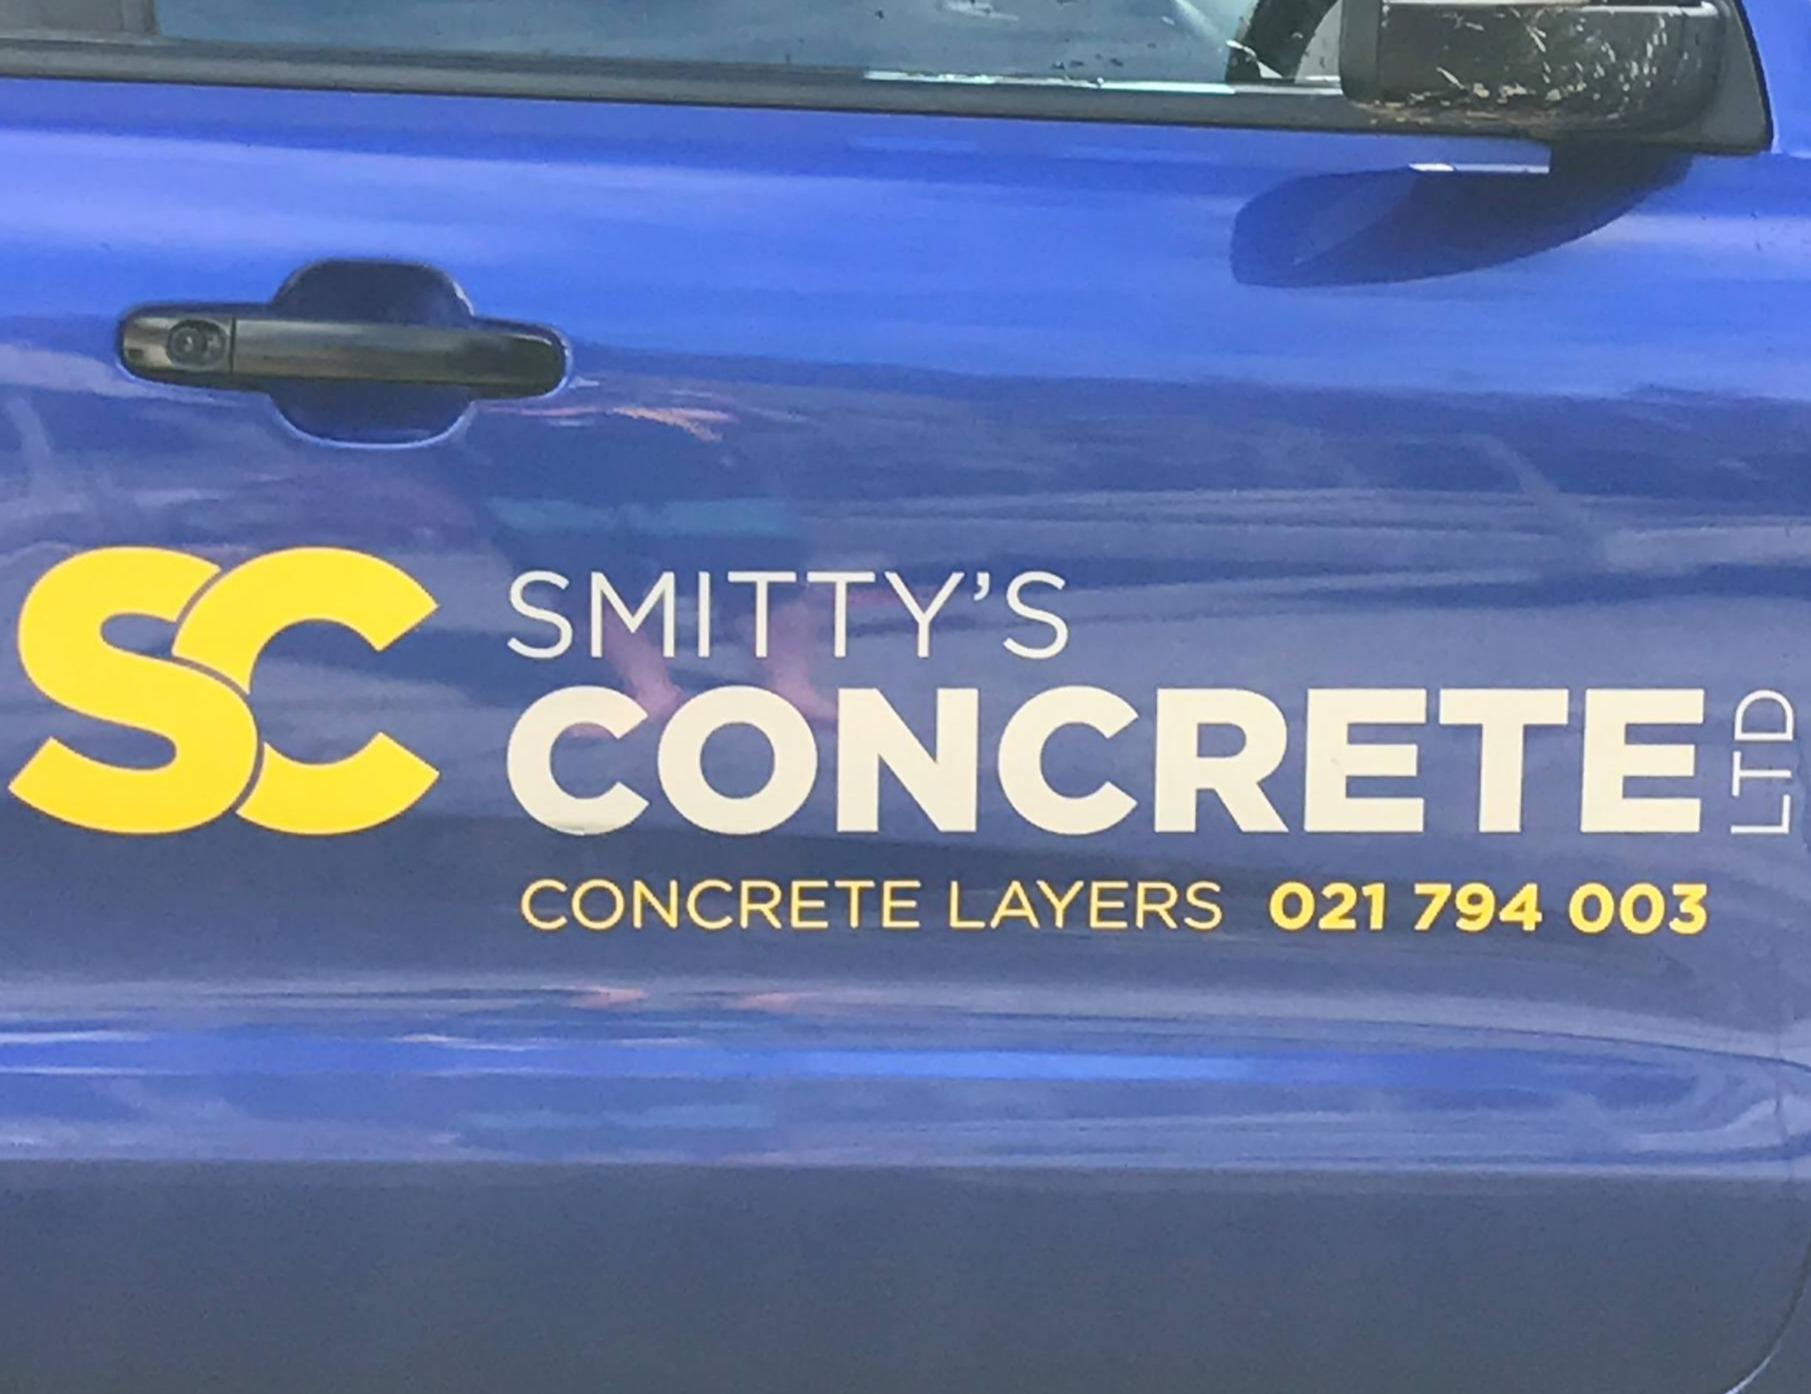 Smitty's Concrete